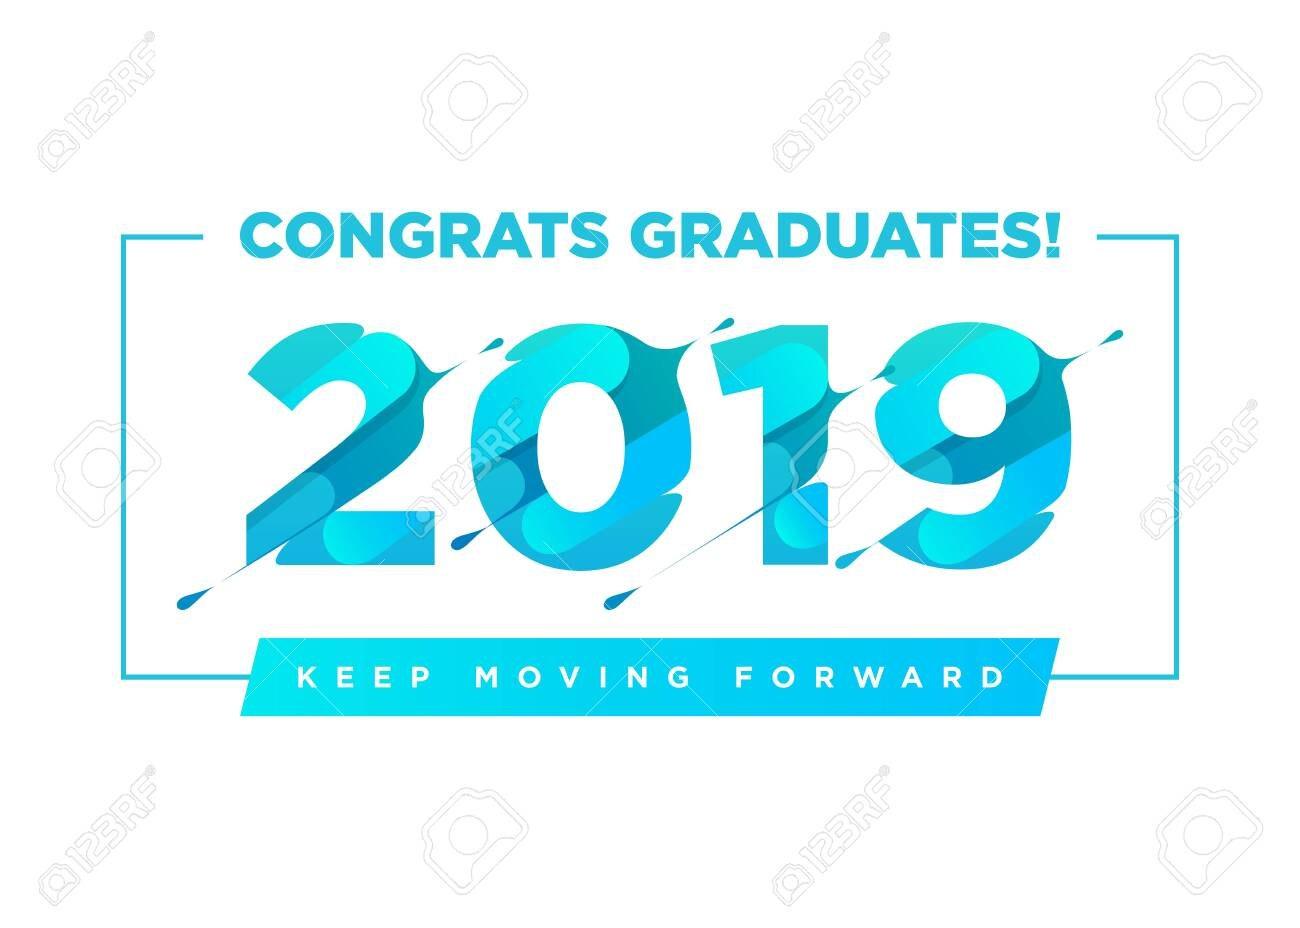 Congratulations Graduates Vector Logo Graduation Background With Graduation Banner Template